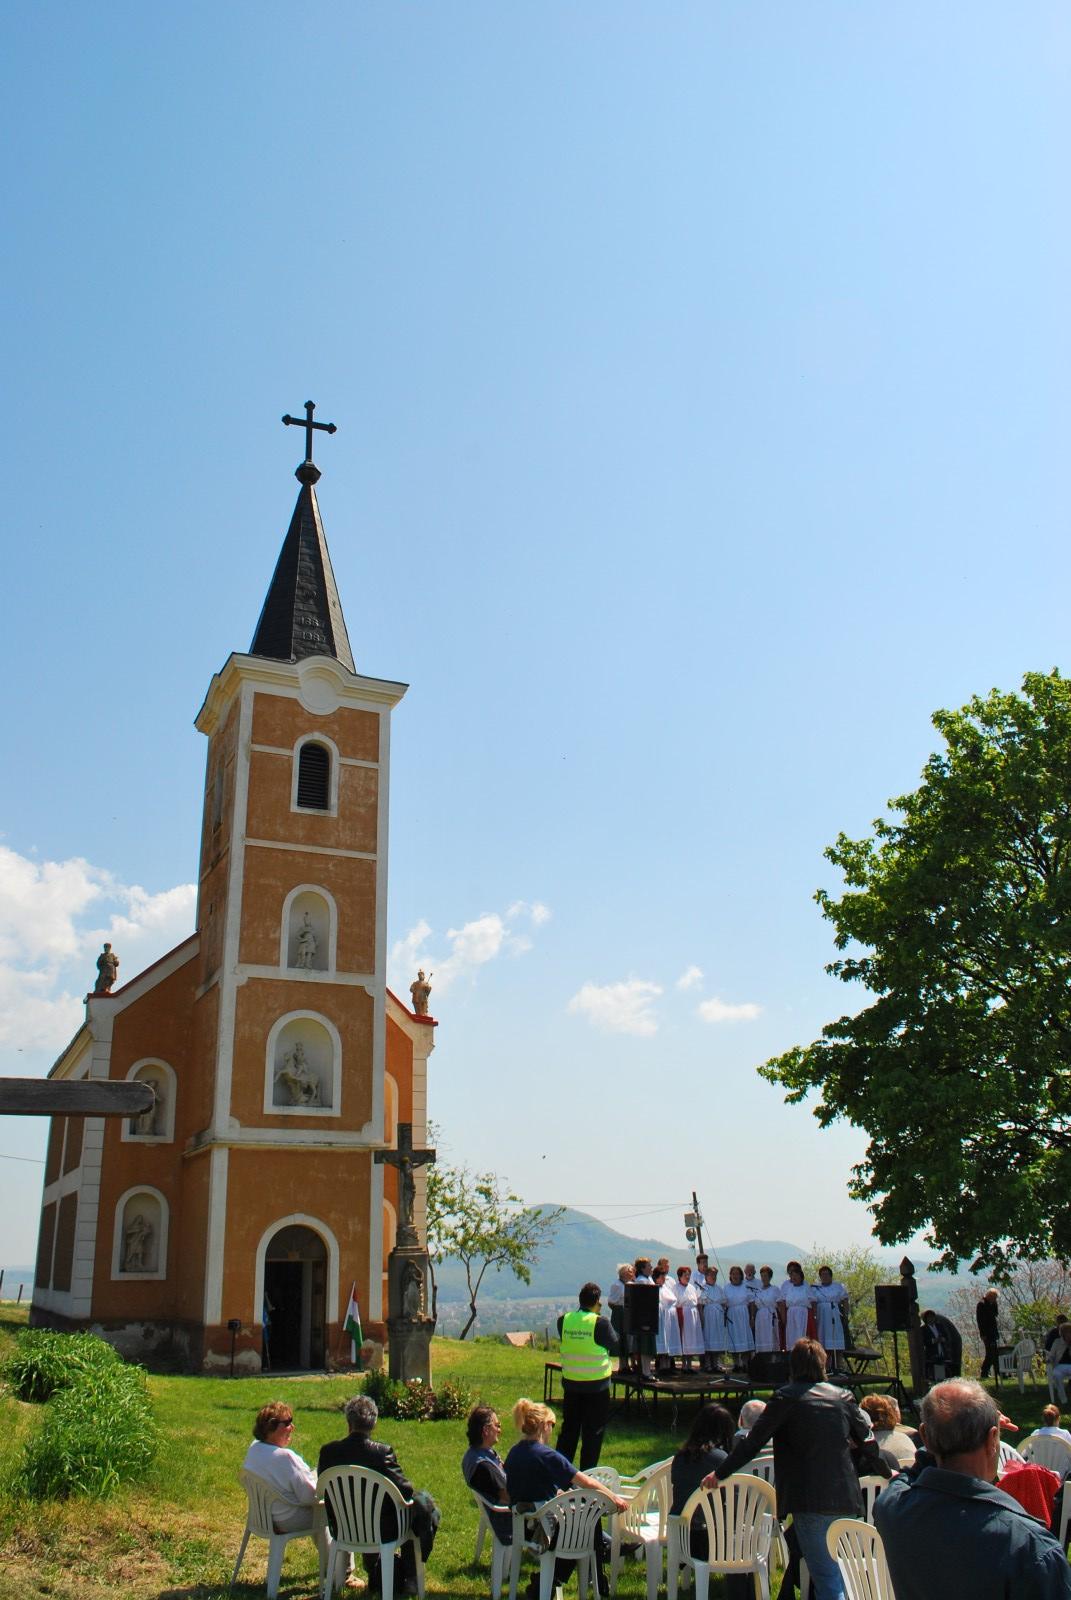 DSC 3743 lengyel kápolna